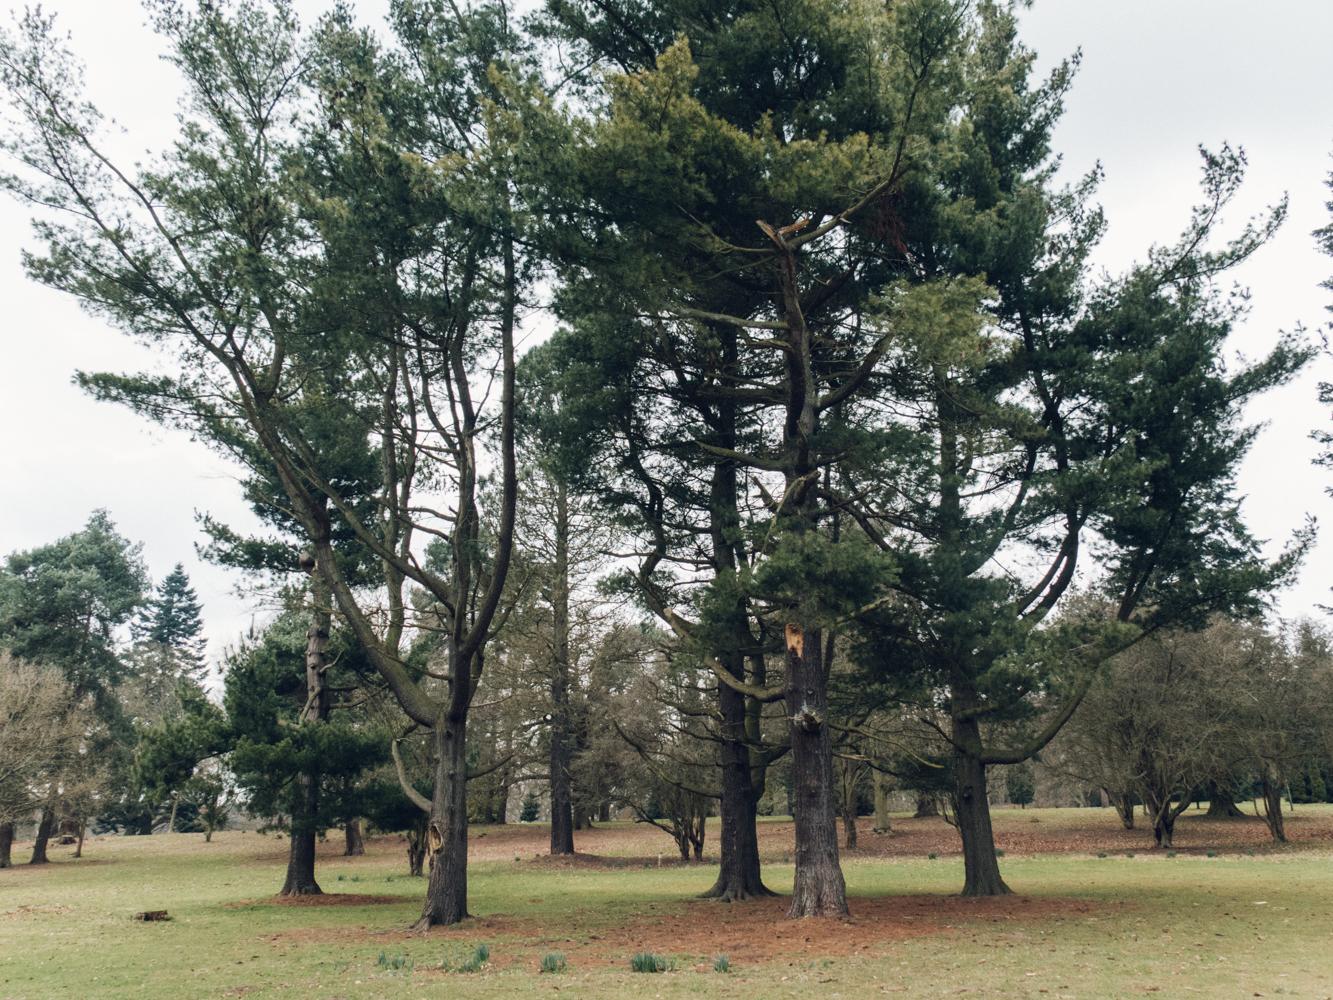 Haarkon Clumber Park Sherwood Forest National Trust Glasshouse Greenhouse Garden Plants Tree Woods Leaf